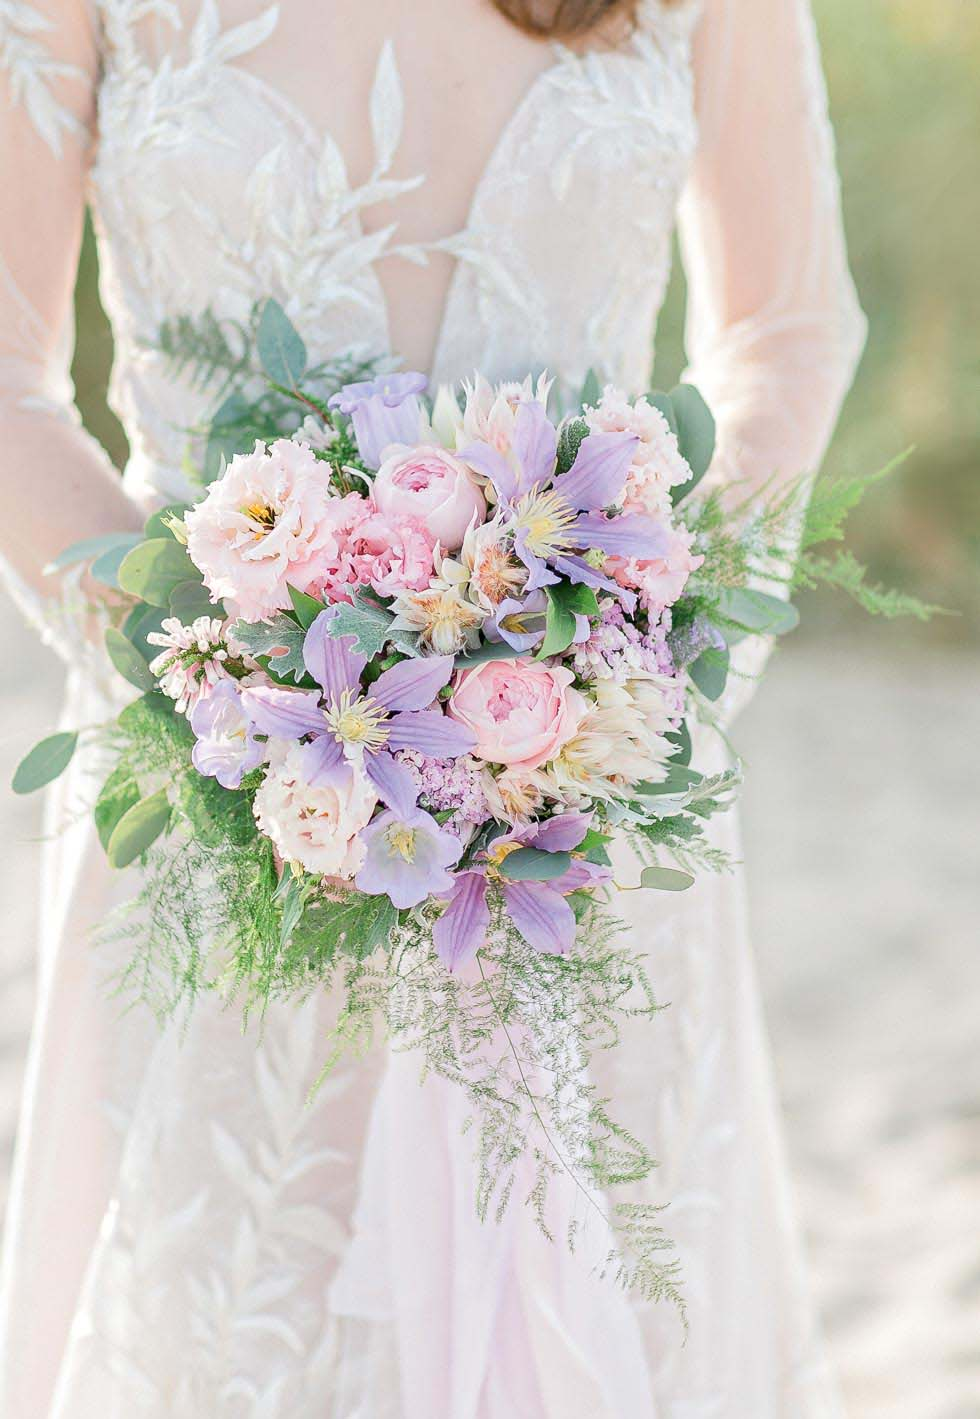 Brautstrauß Rosa Creme Lila